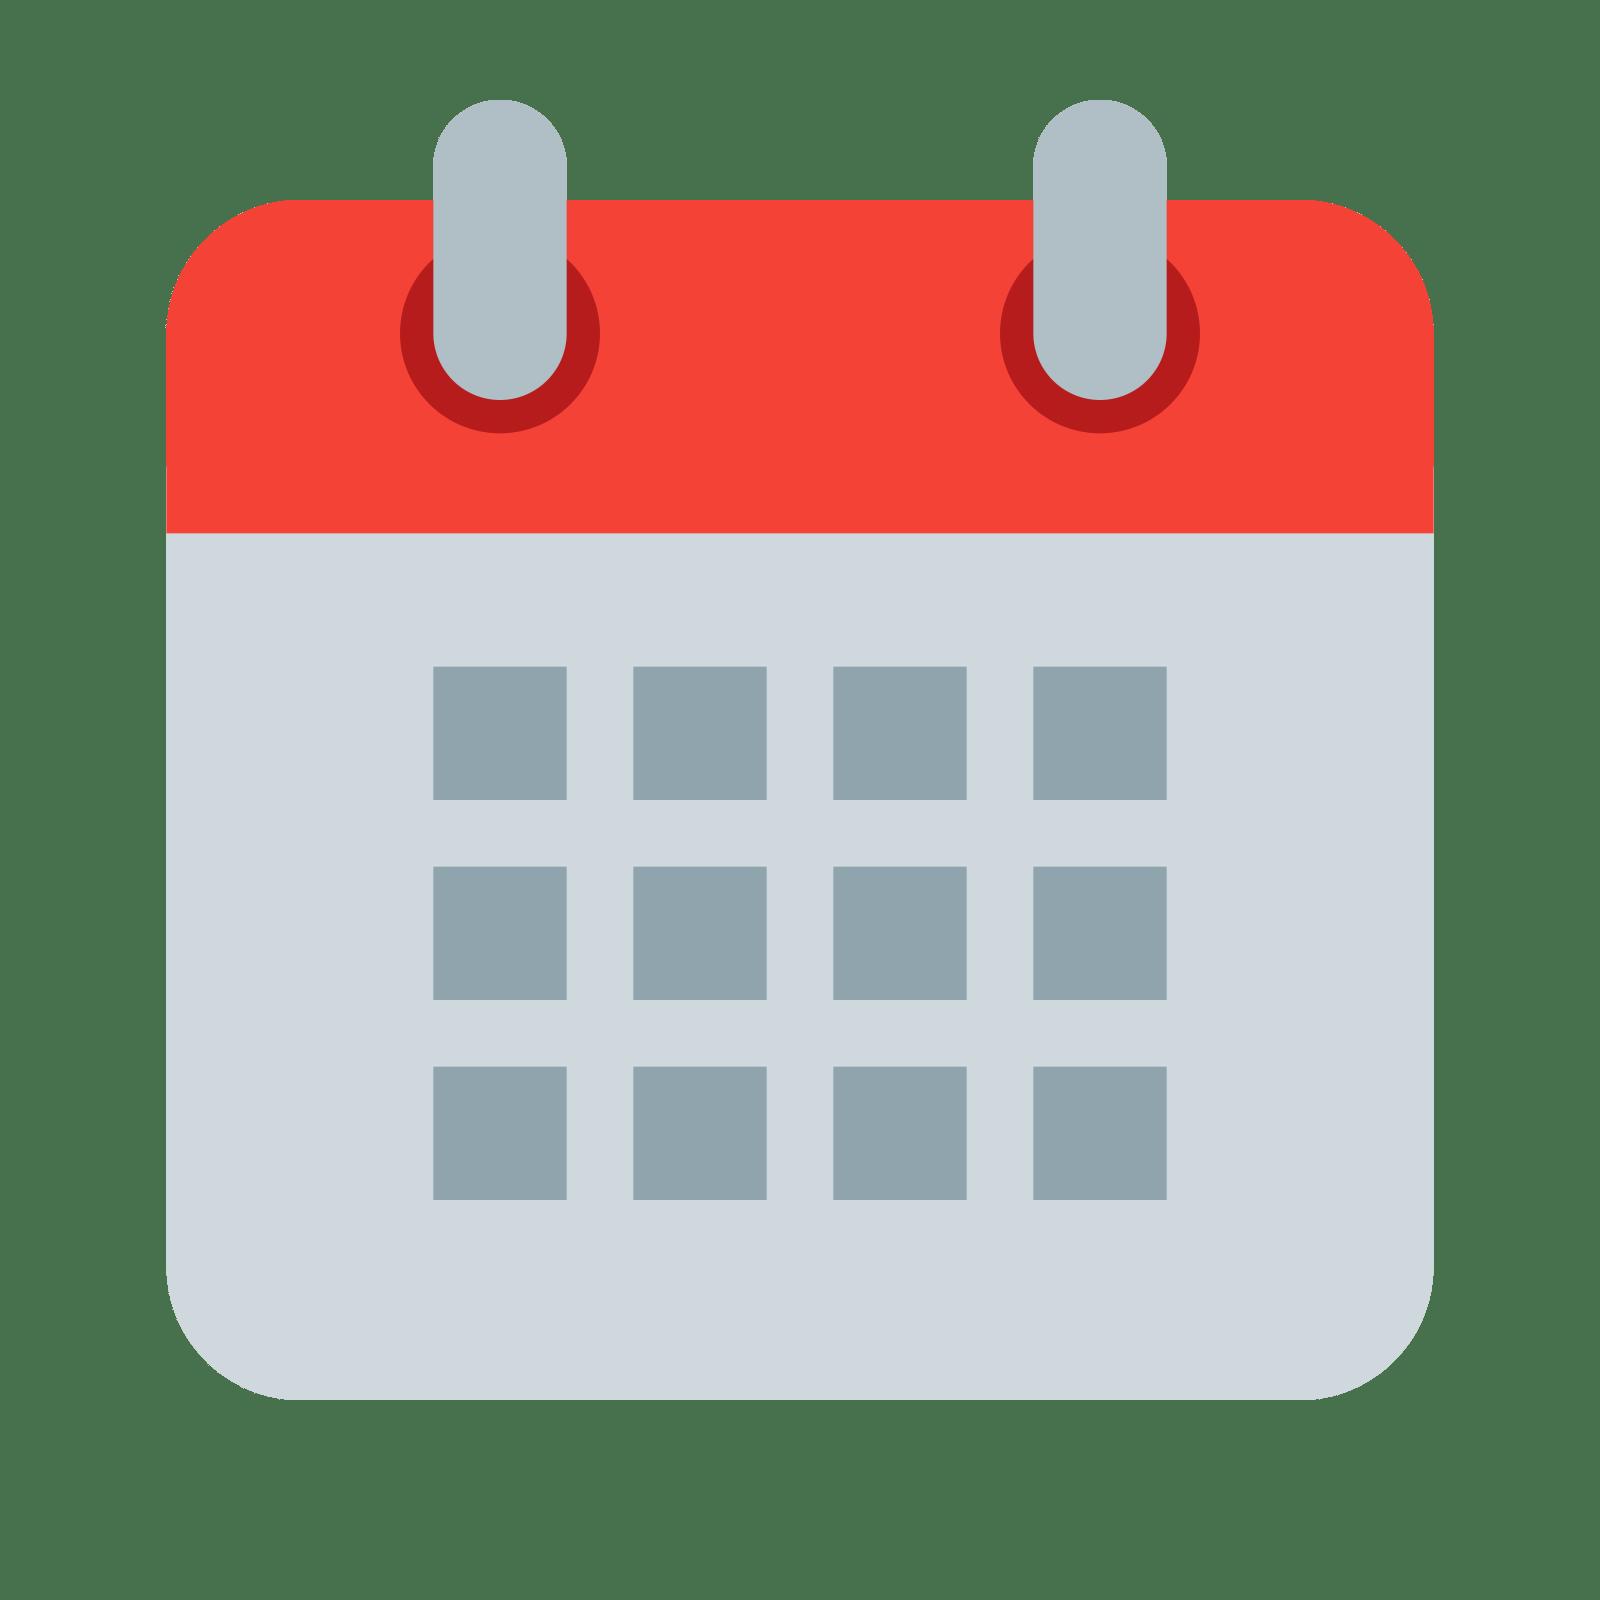 free blank printable 2018 2019 calendar freshcalendars com rh freshcalendars com calendar clipart 2018 calendar clip art for january